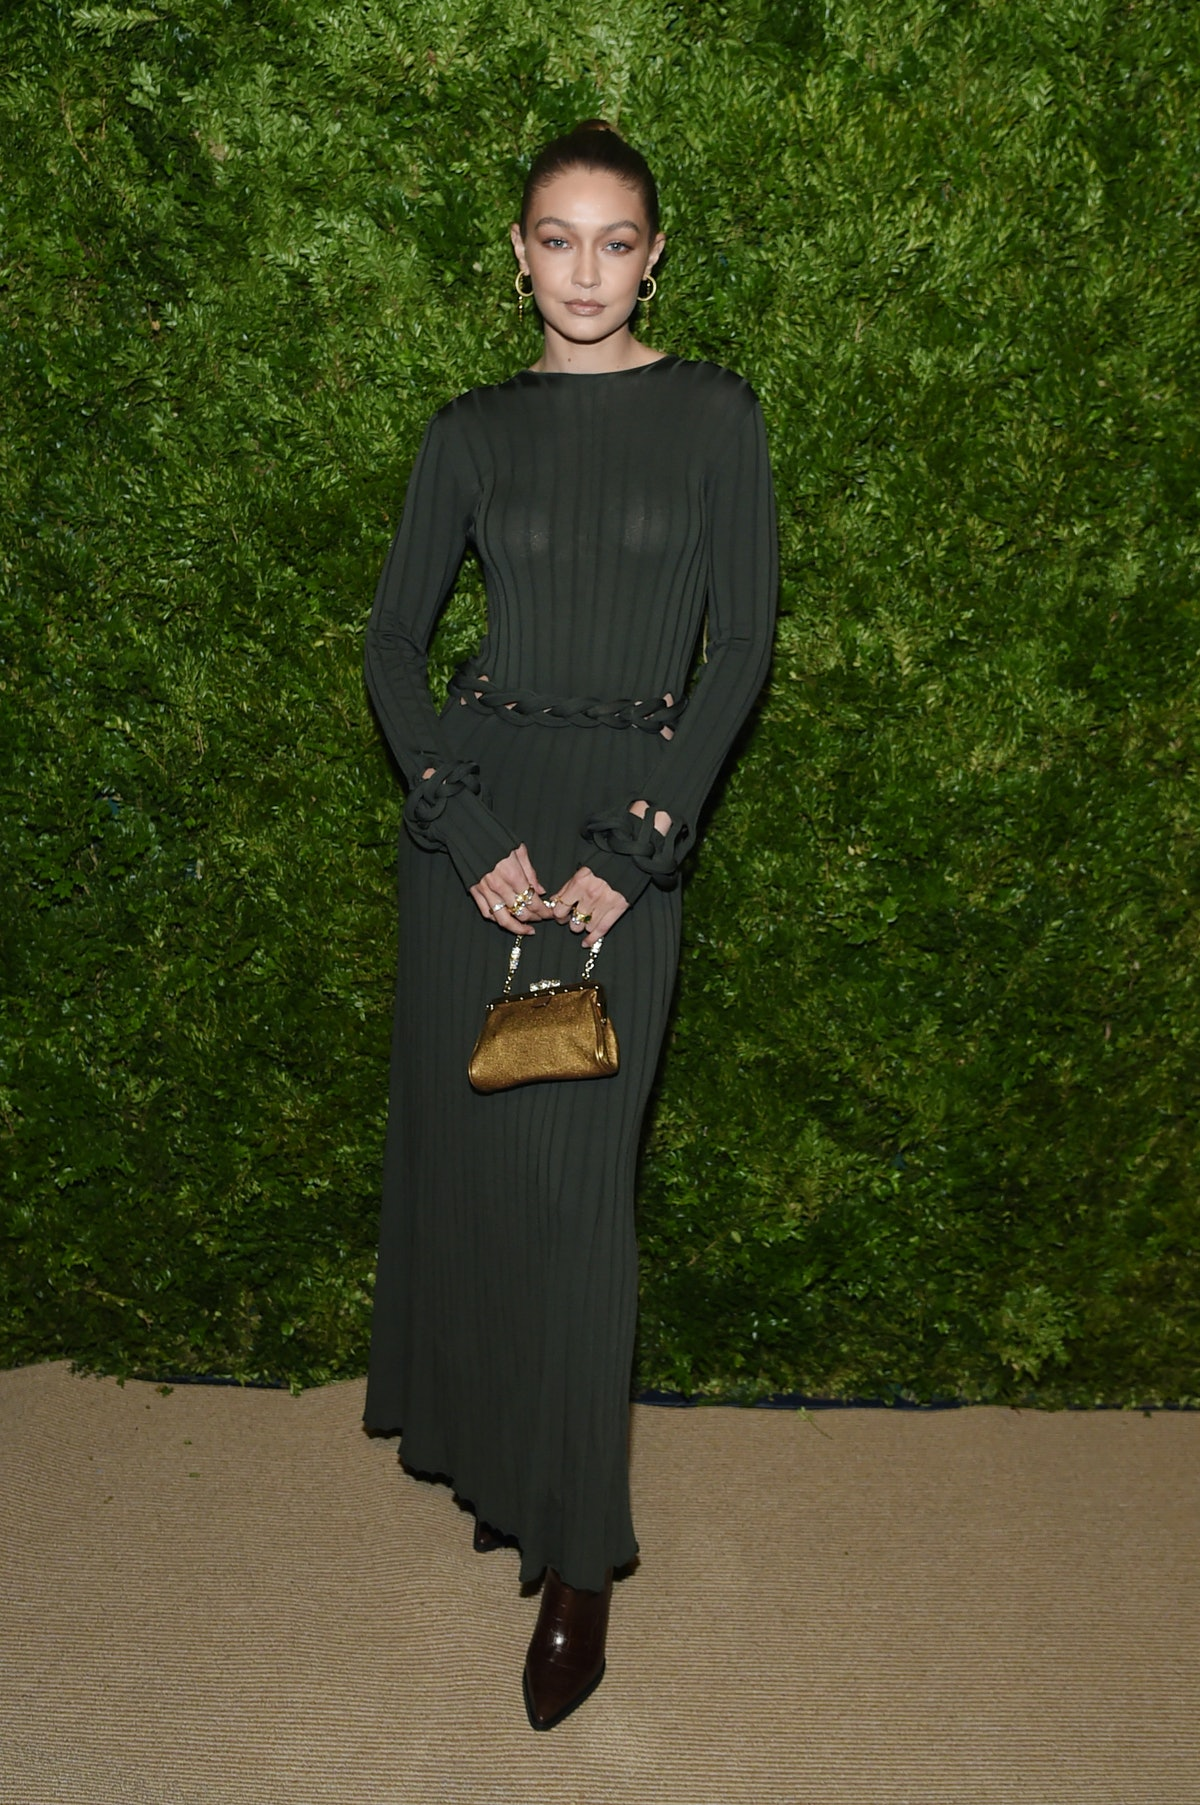 NEW YORK, NEW YORK - NOVEMBER 04: Gigi Hadid attends the CFDA / Vogue Fashion Fund 2019 Awards at Ci...